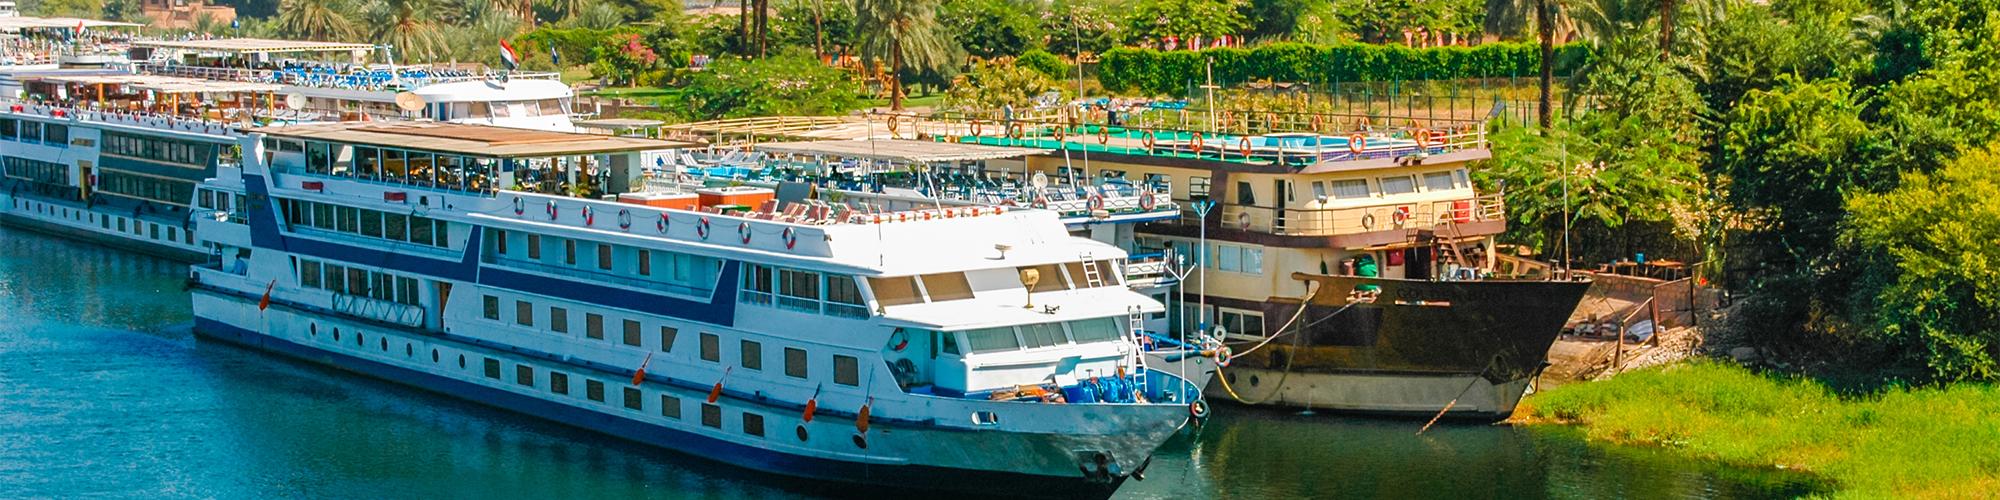 Nile Cruise From El Gouna - El Gouna Nile Cruise - El Gouna Excursions - Tours From Hurghada